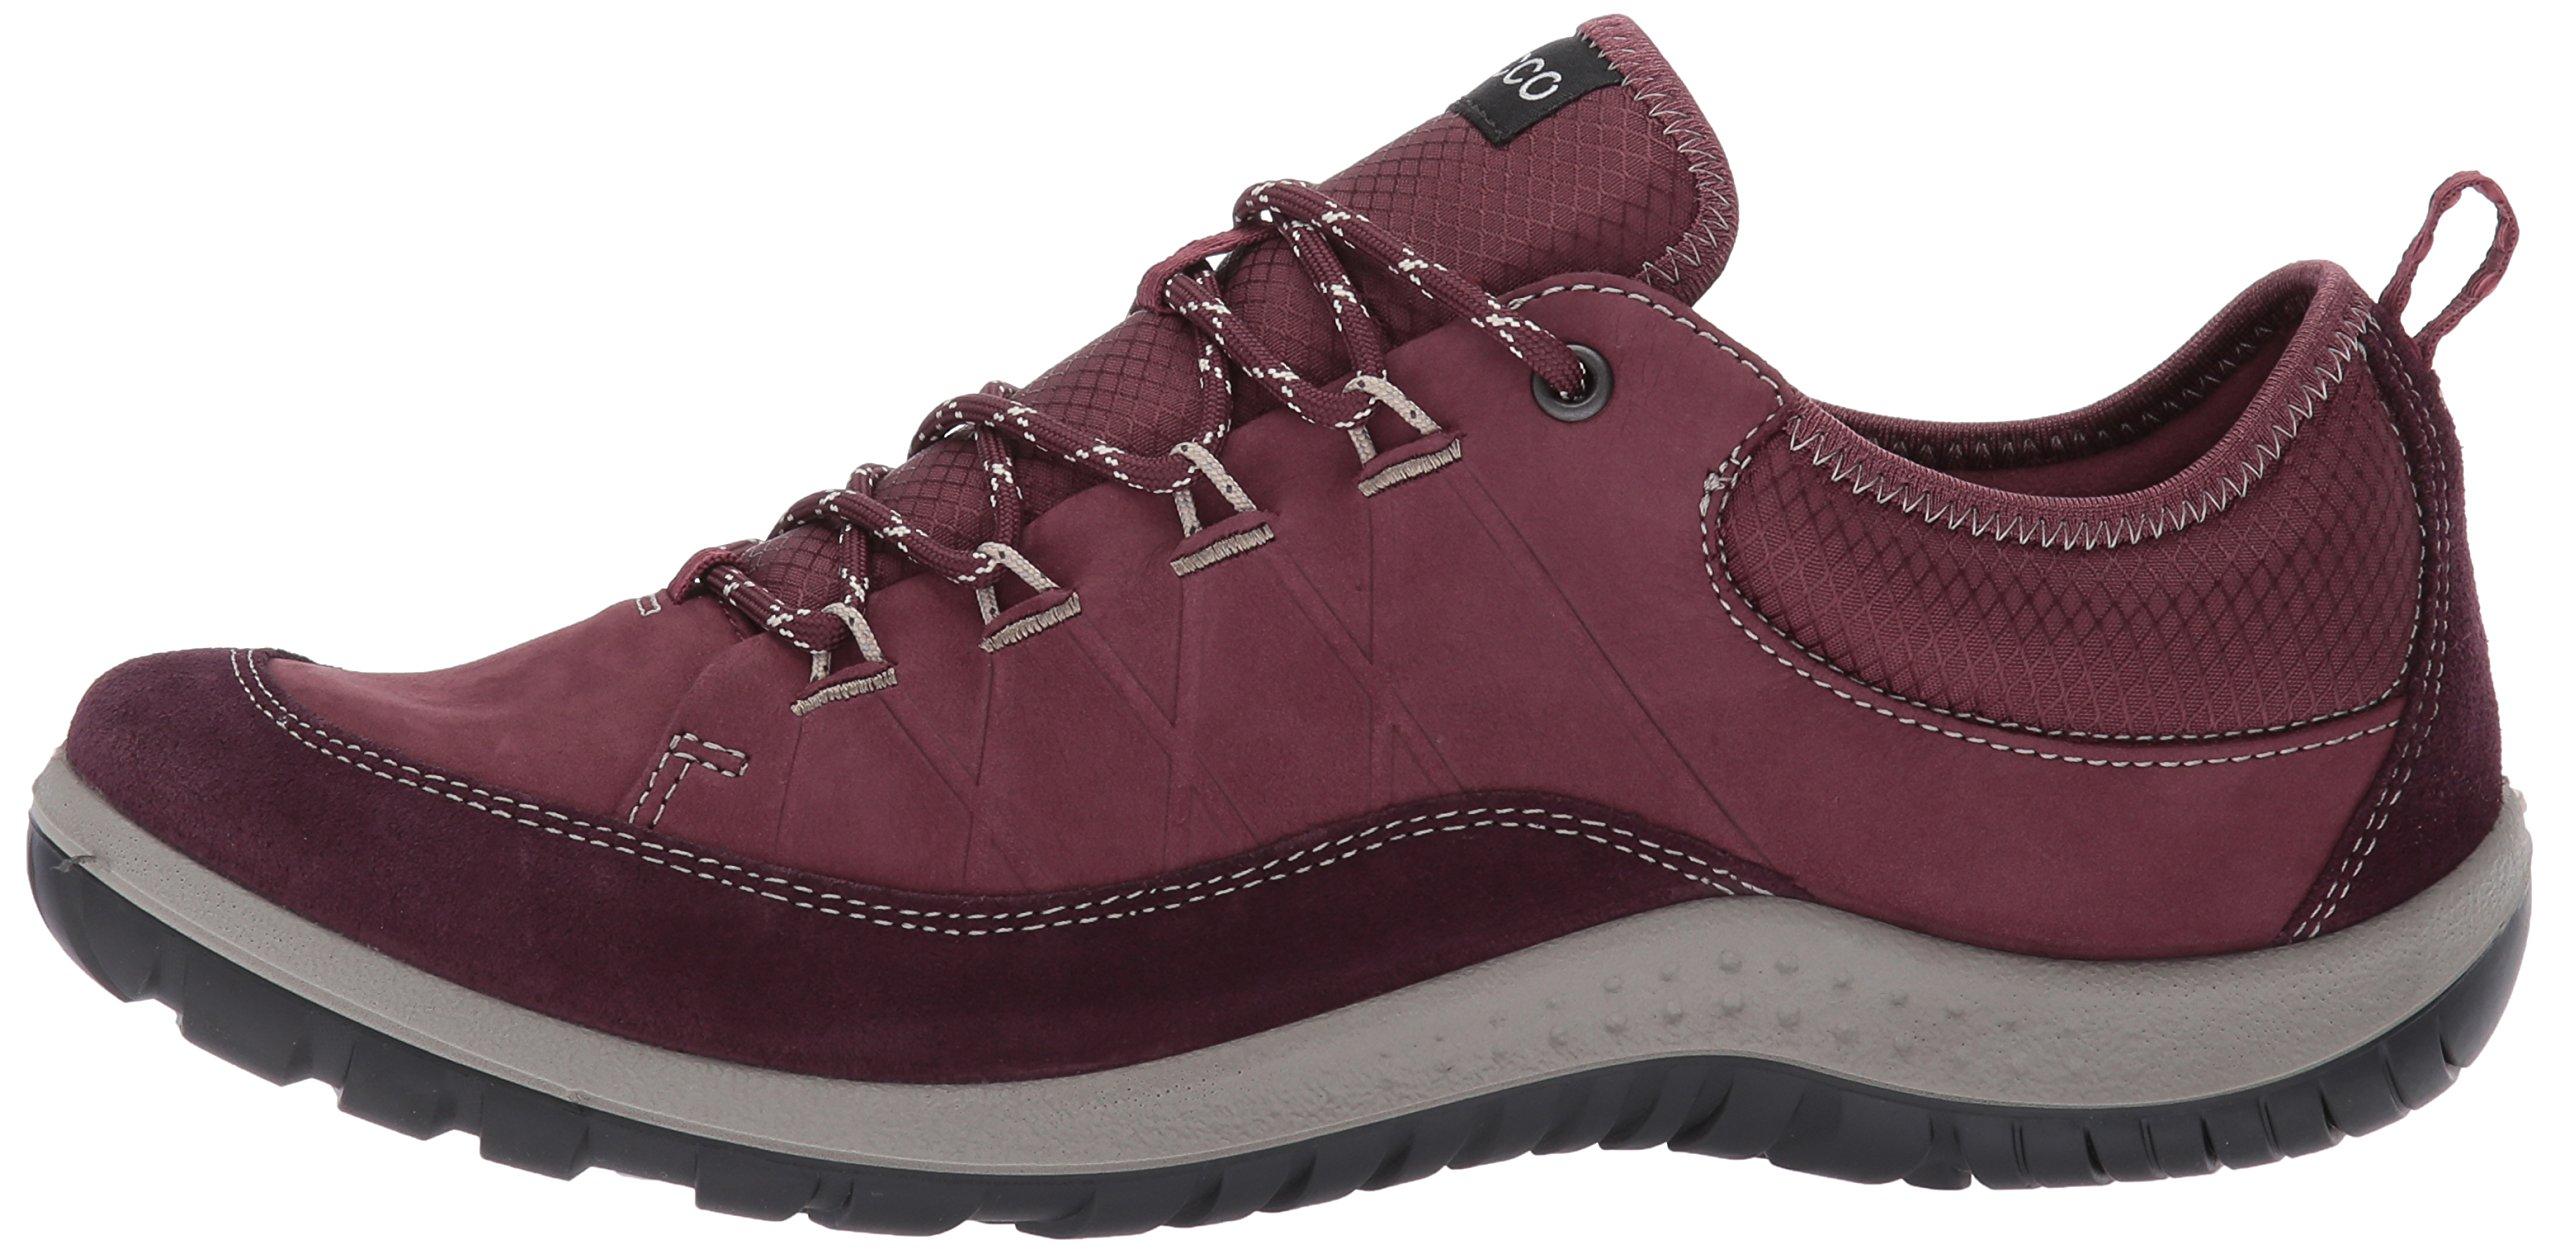 81I12wiZtGL - ECCO Women's Aspina Multisport Outdoor Shoes